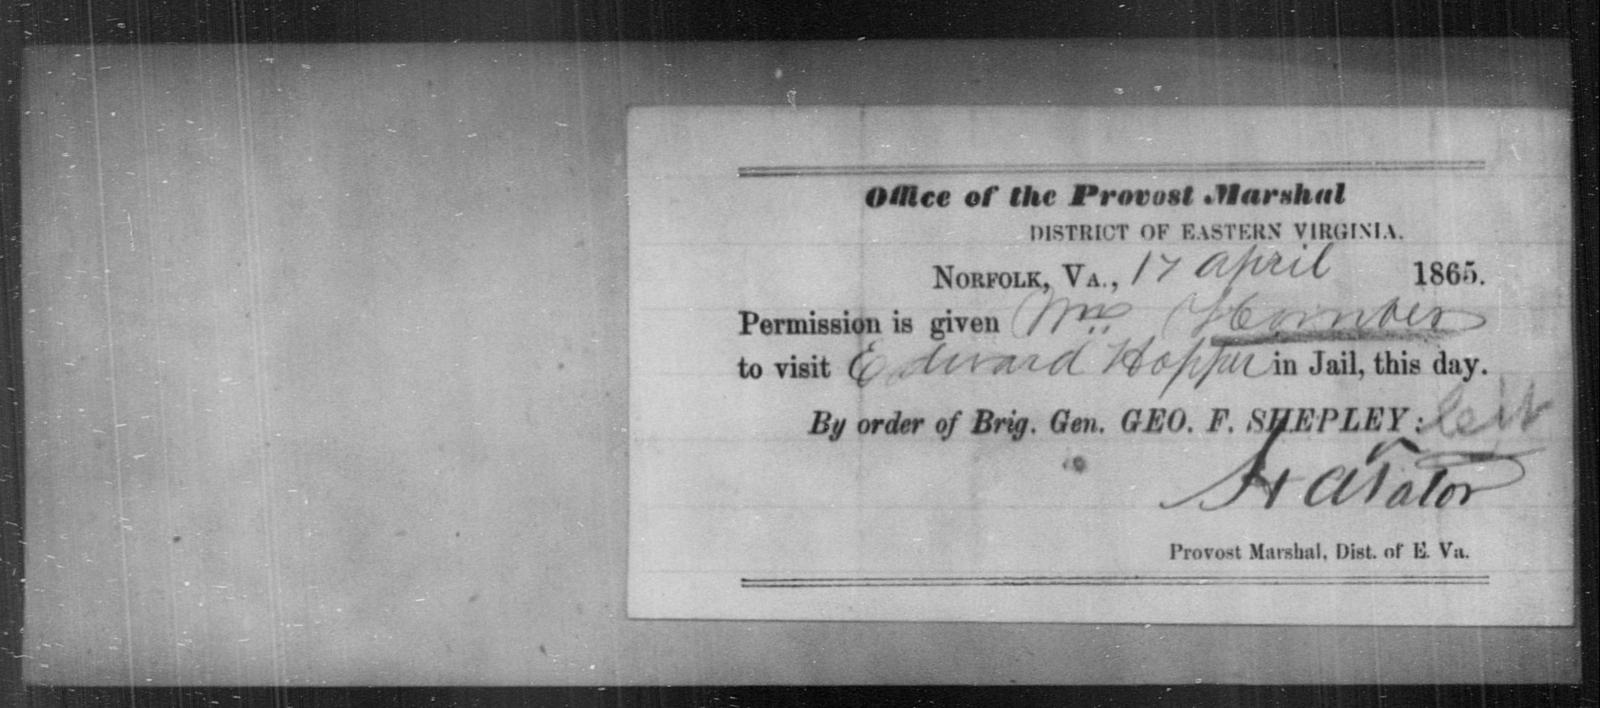 Homan, Wm - State: Virginia - Year: 1865